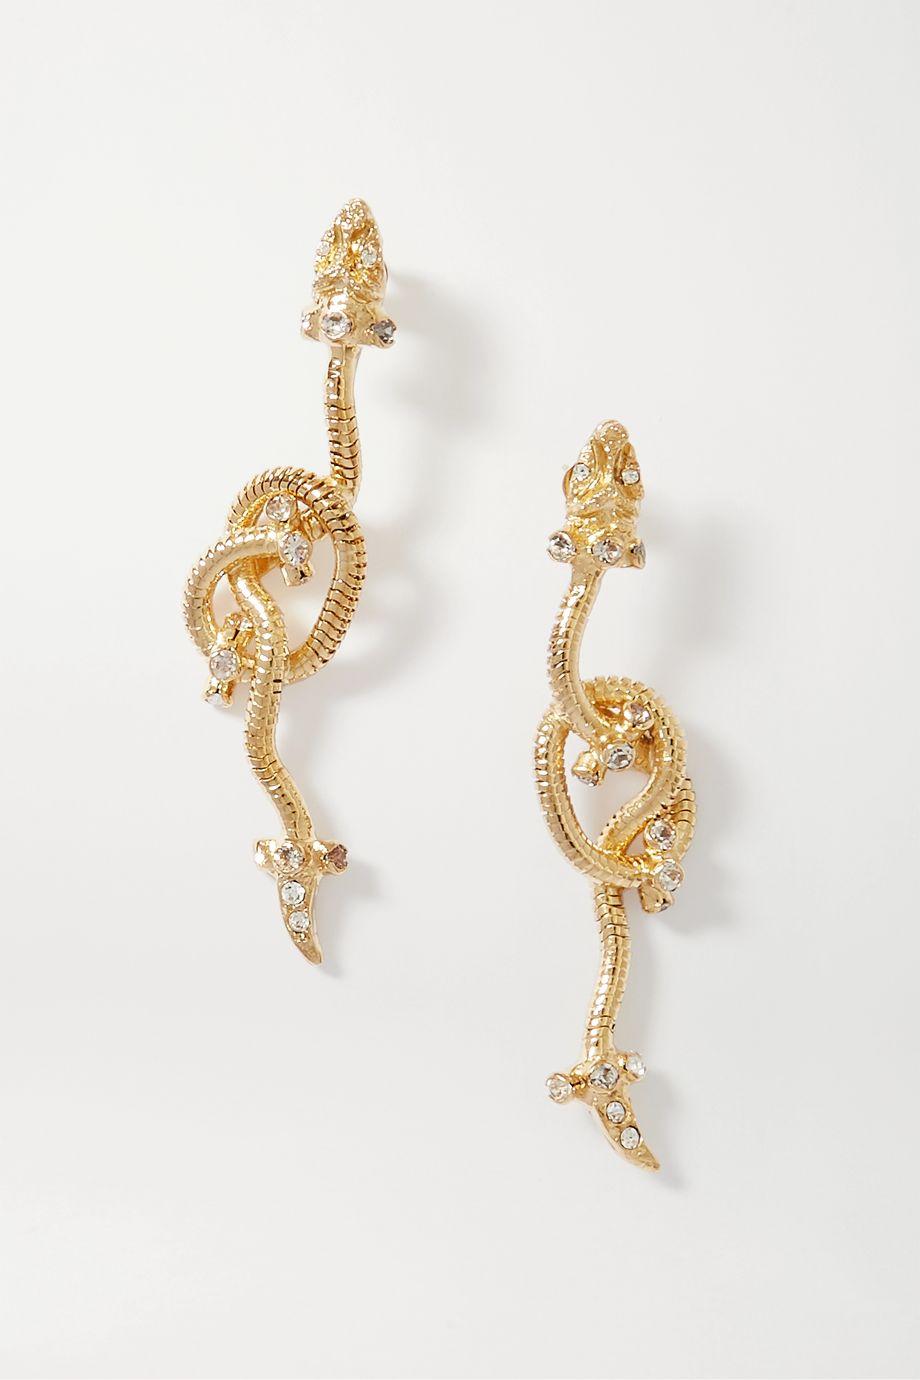 Rosantica Giza gold-tone and crystal earrings